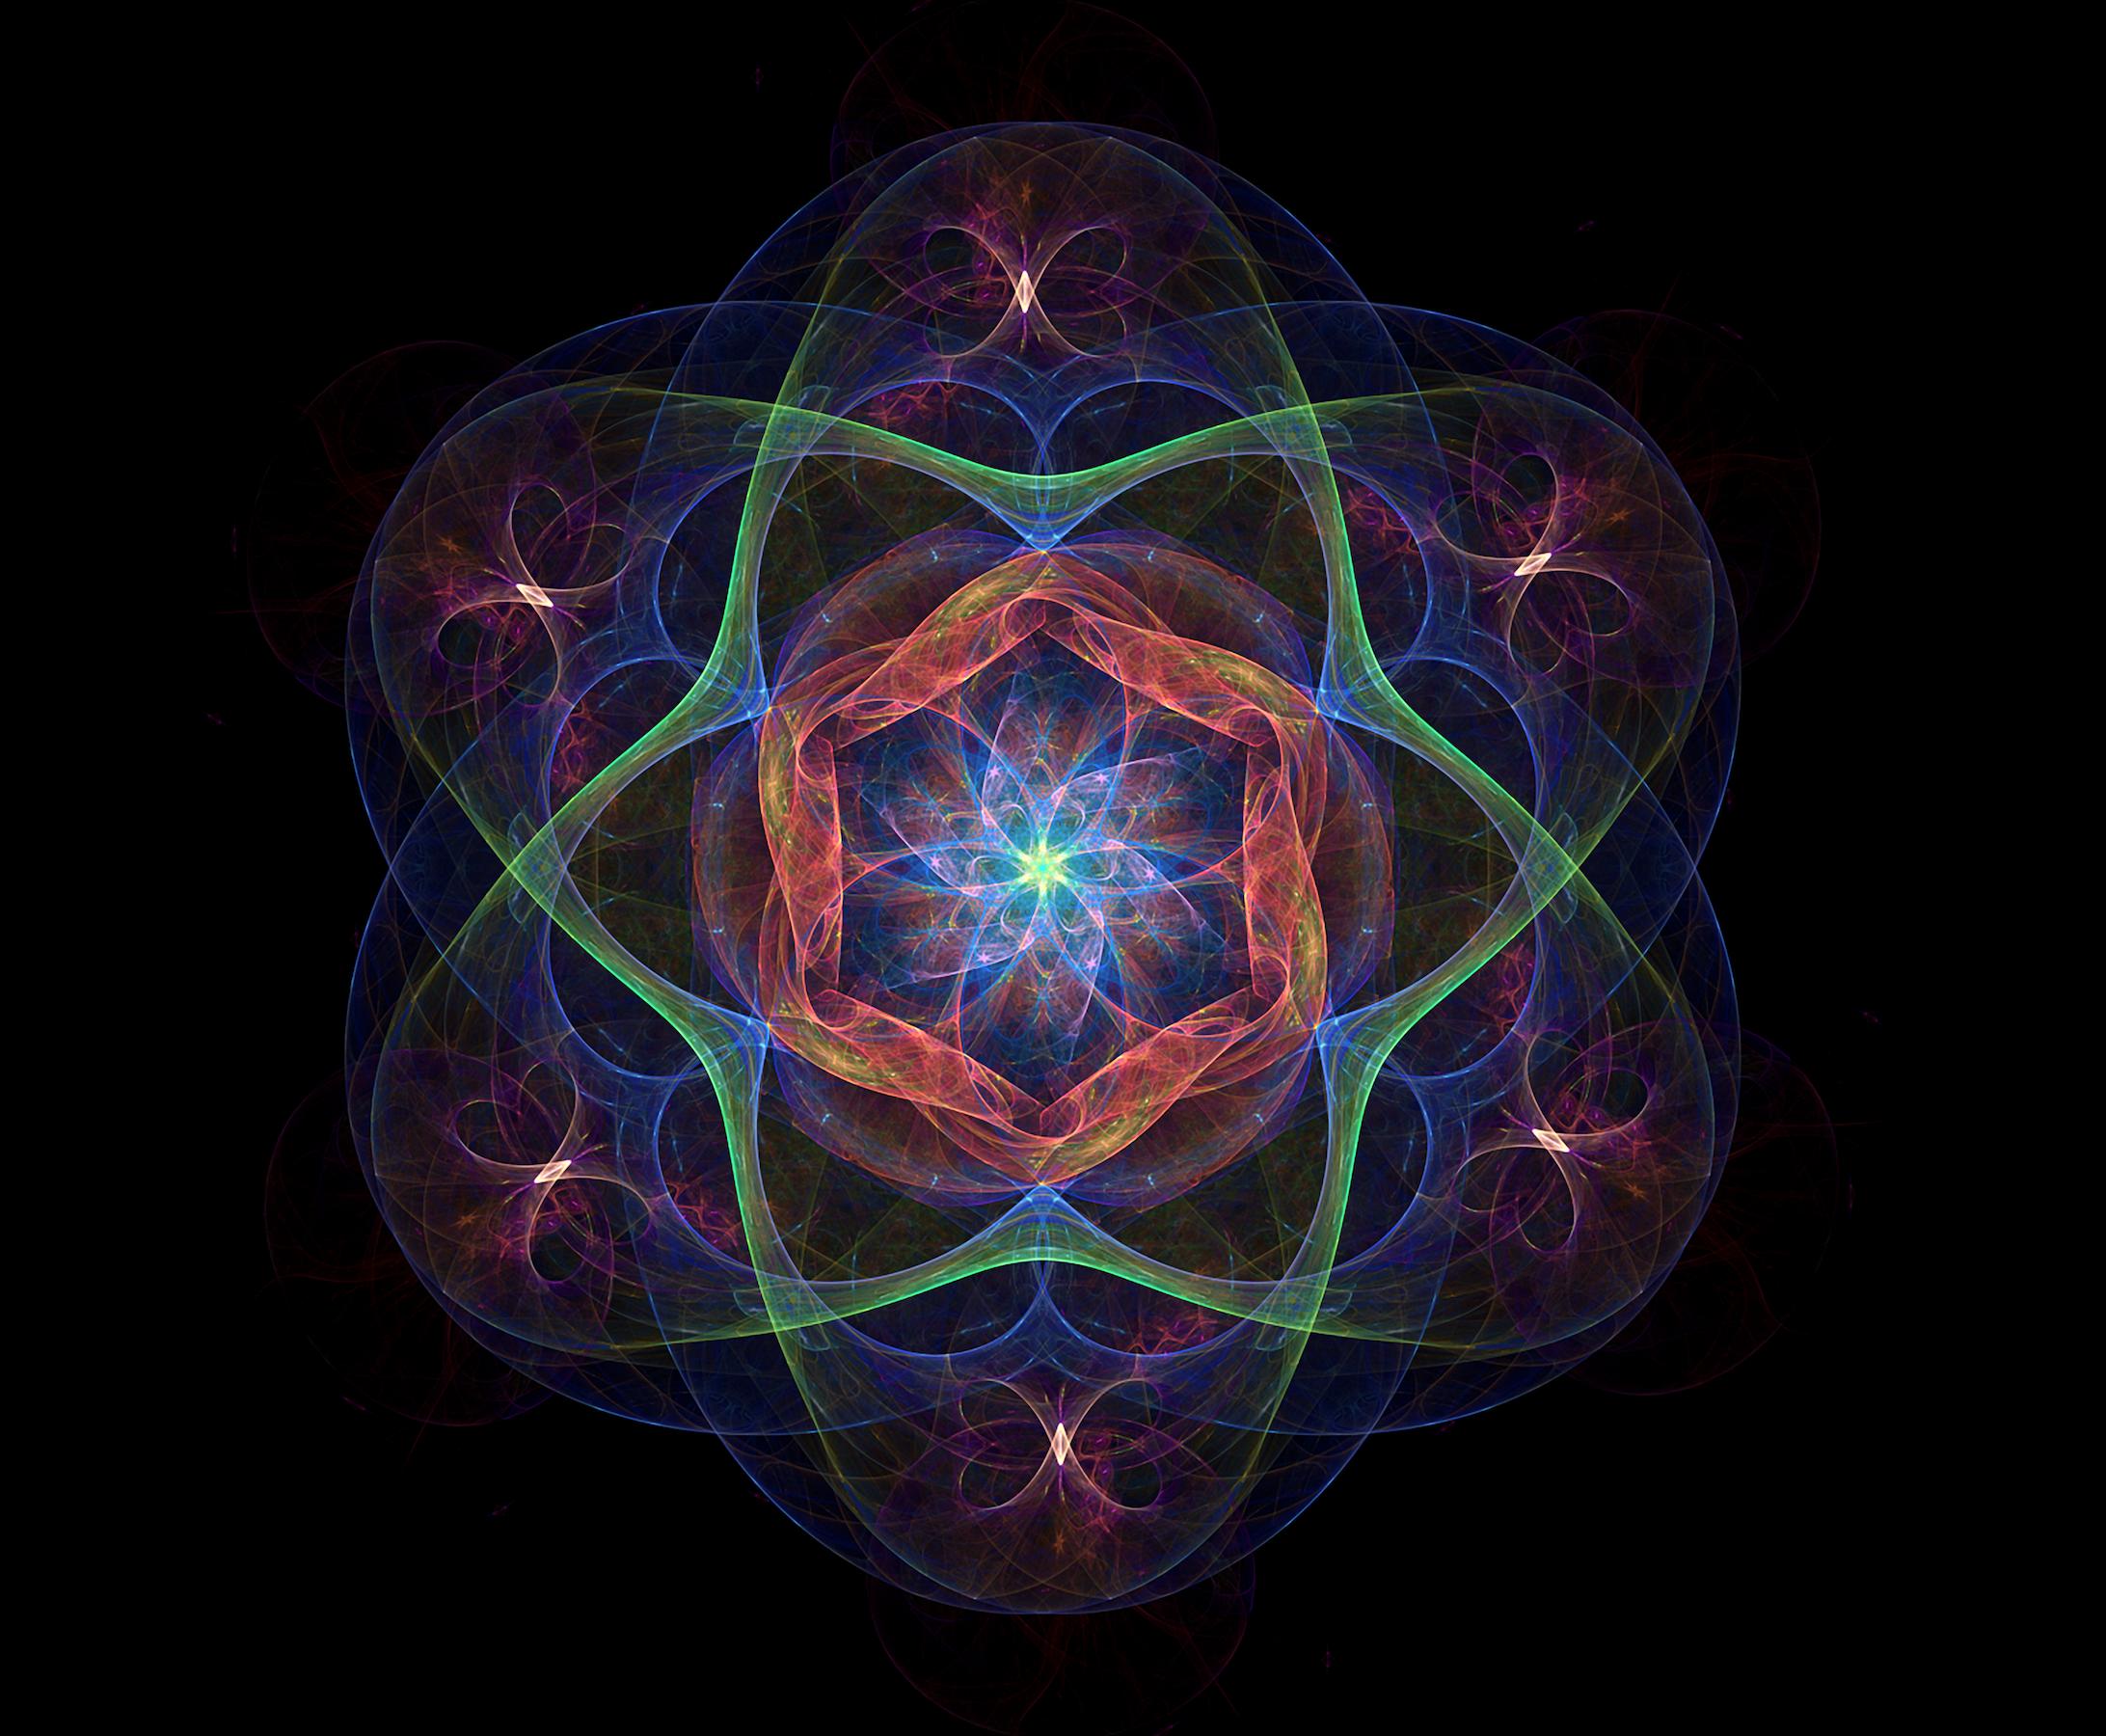 Hexahedron Toroidal Field Within Flower Of Life Fractal Art By Leon Van Kraayenburg